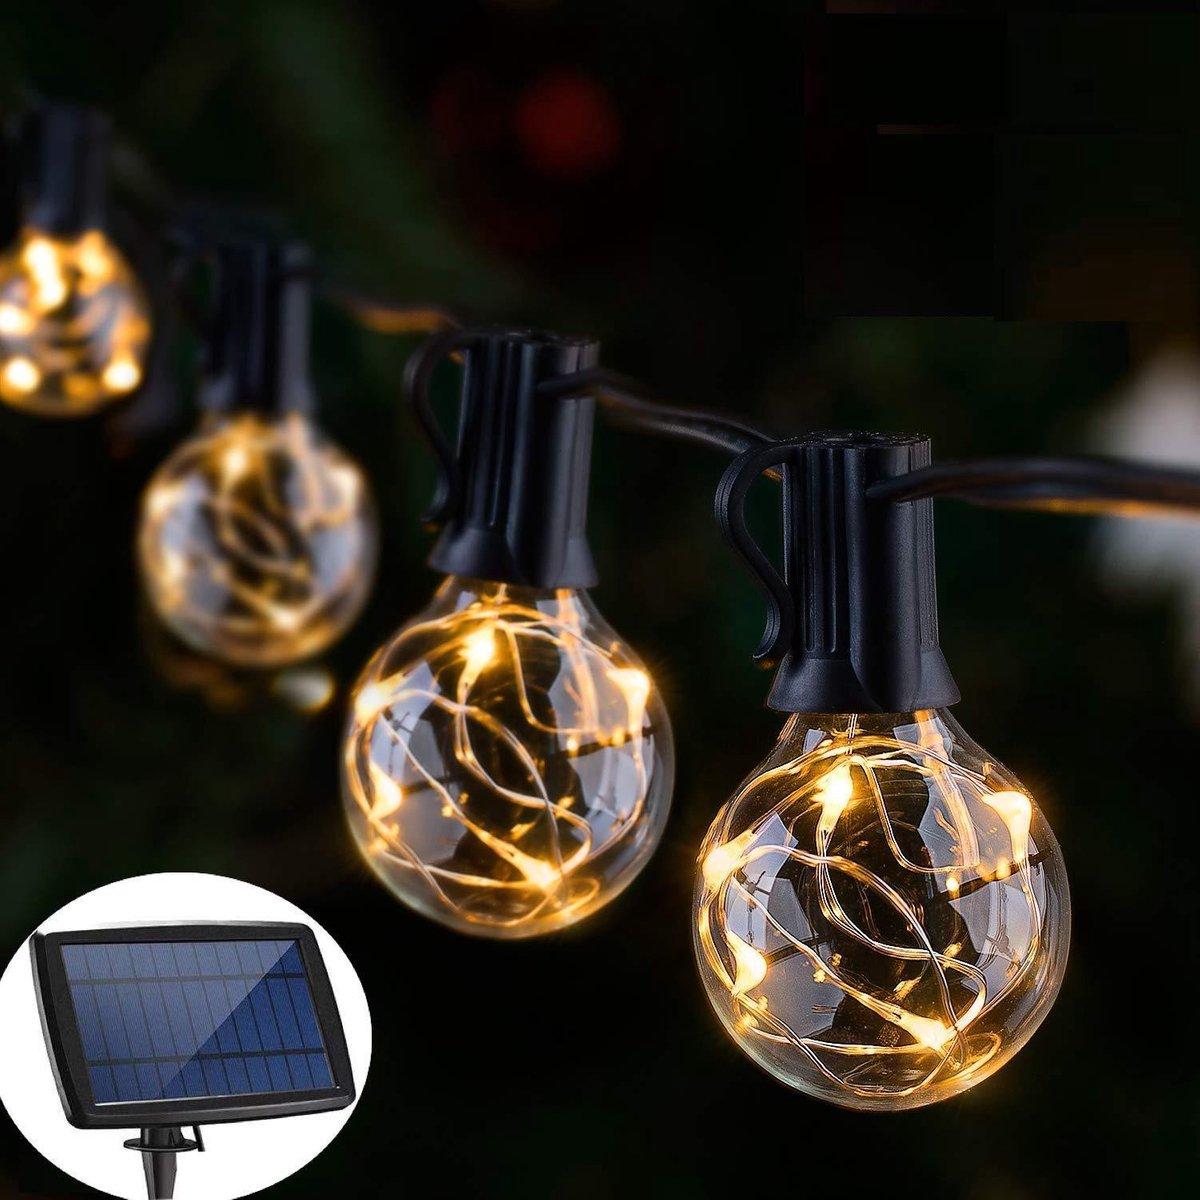 J-Pro Tuinverlichting op zonne-energie - 25 Solar Copper LED 8,5m lichtsnoer lichtslinger